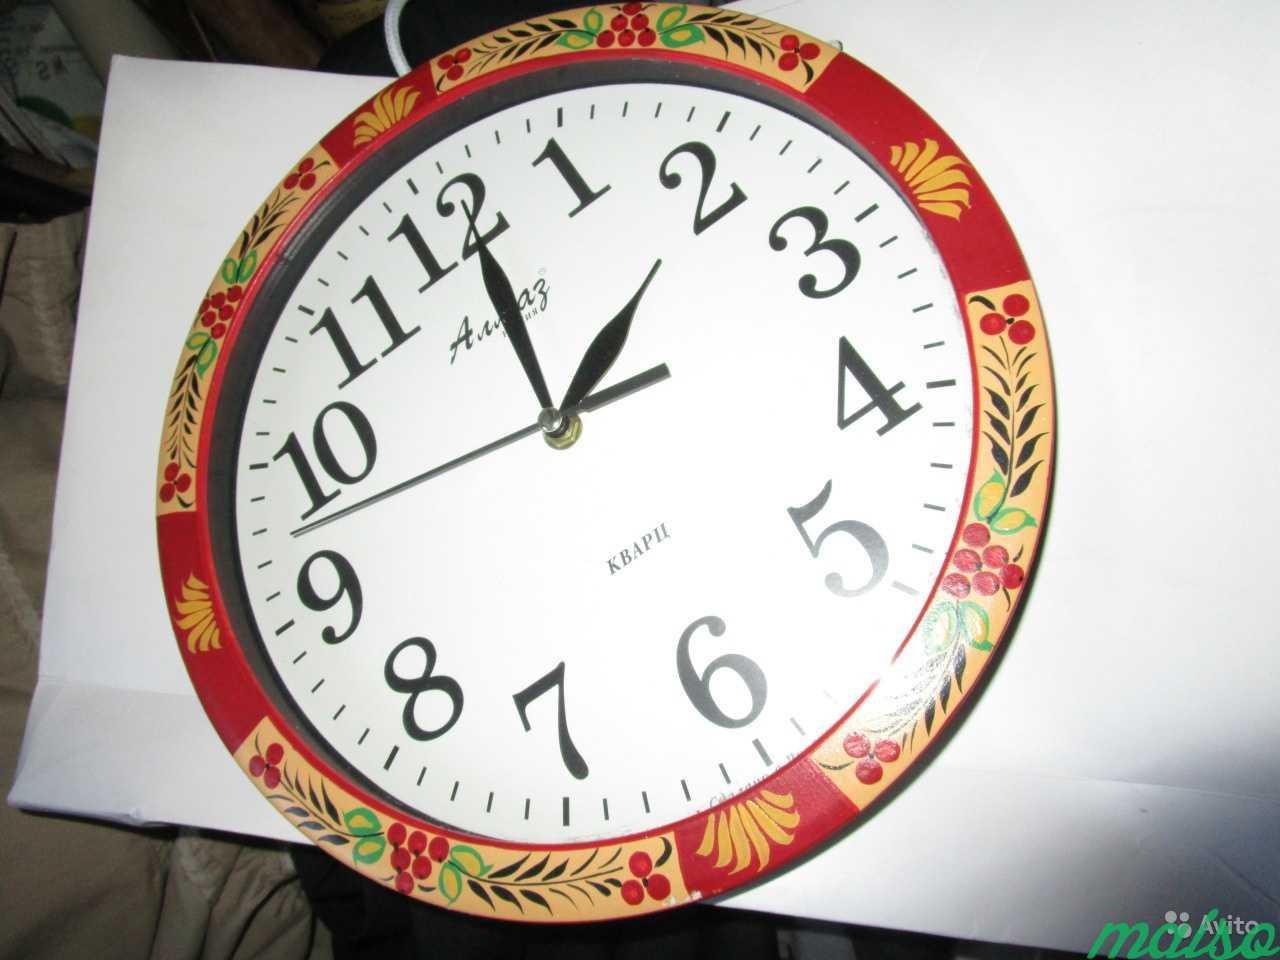 Часы настенные кварц Алмаз хохлома роспись в Москве. Фото 1